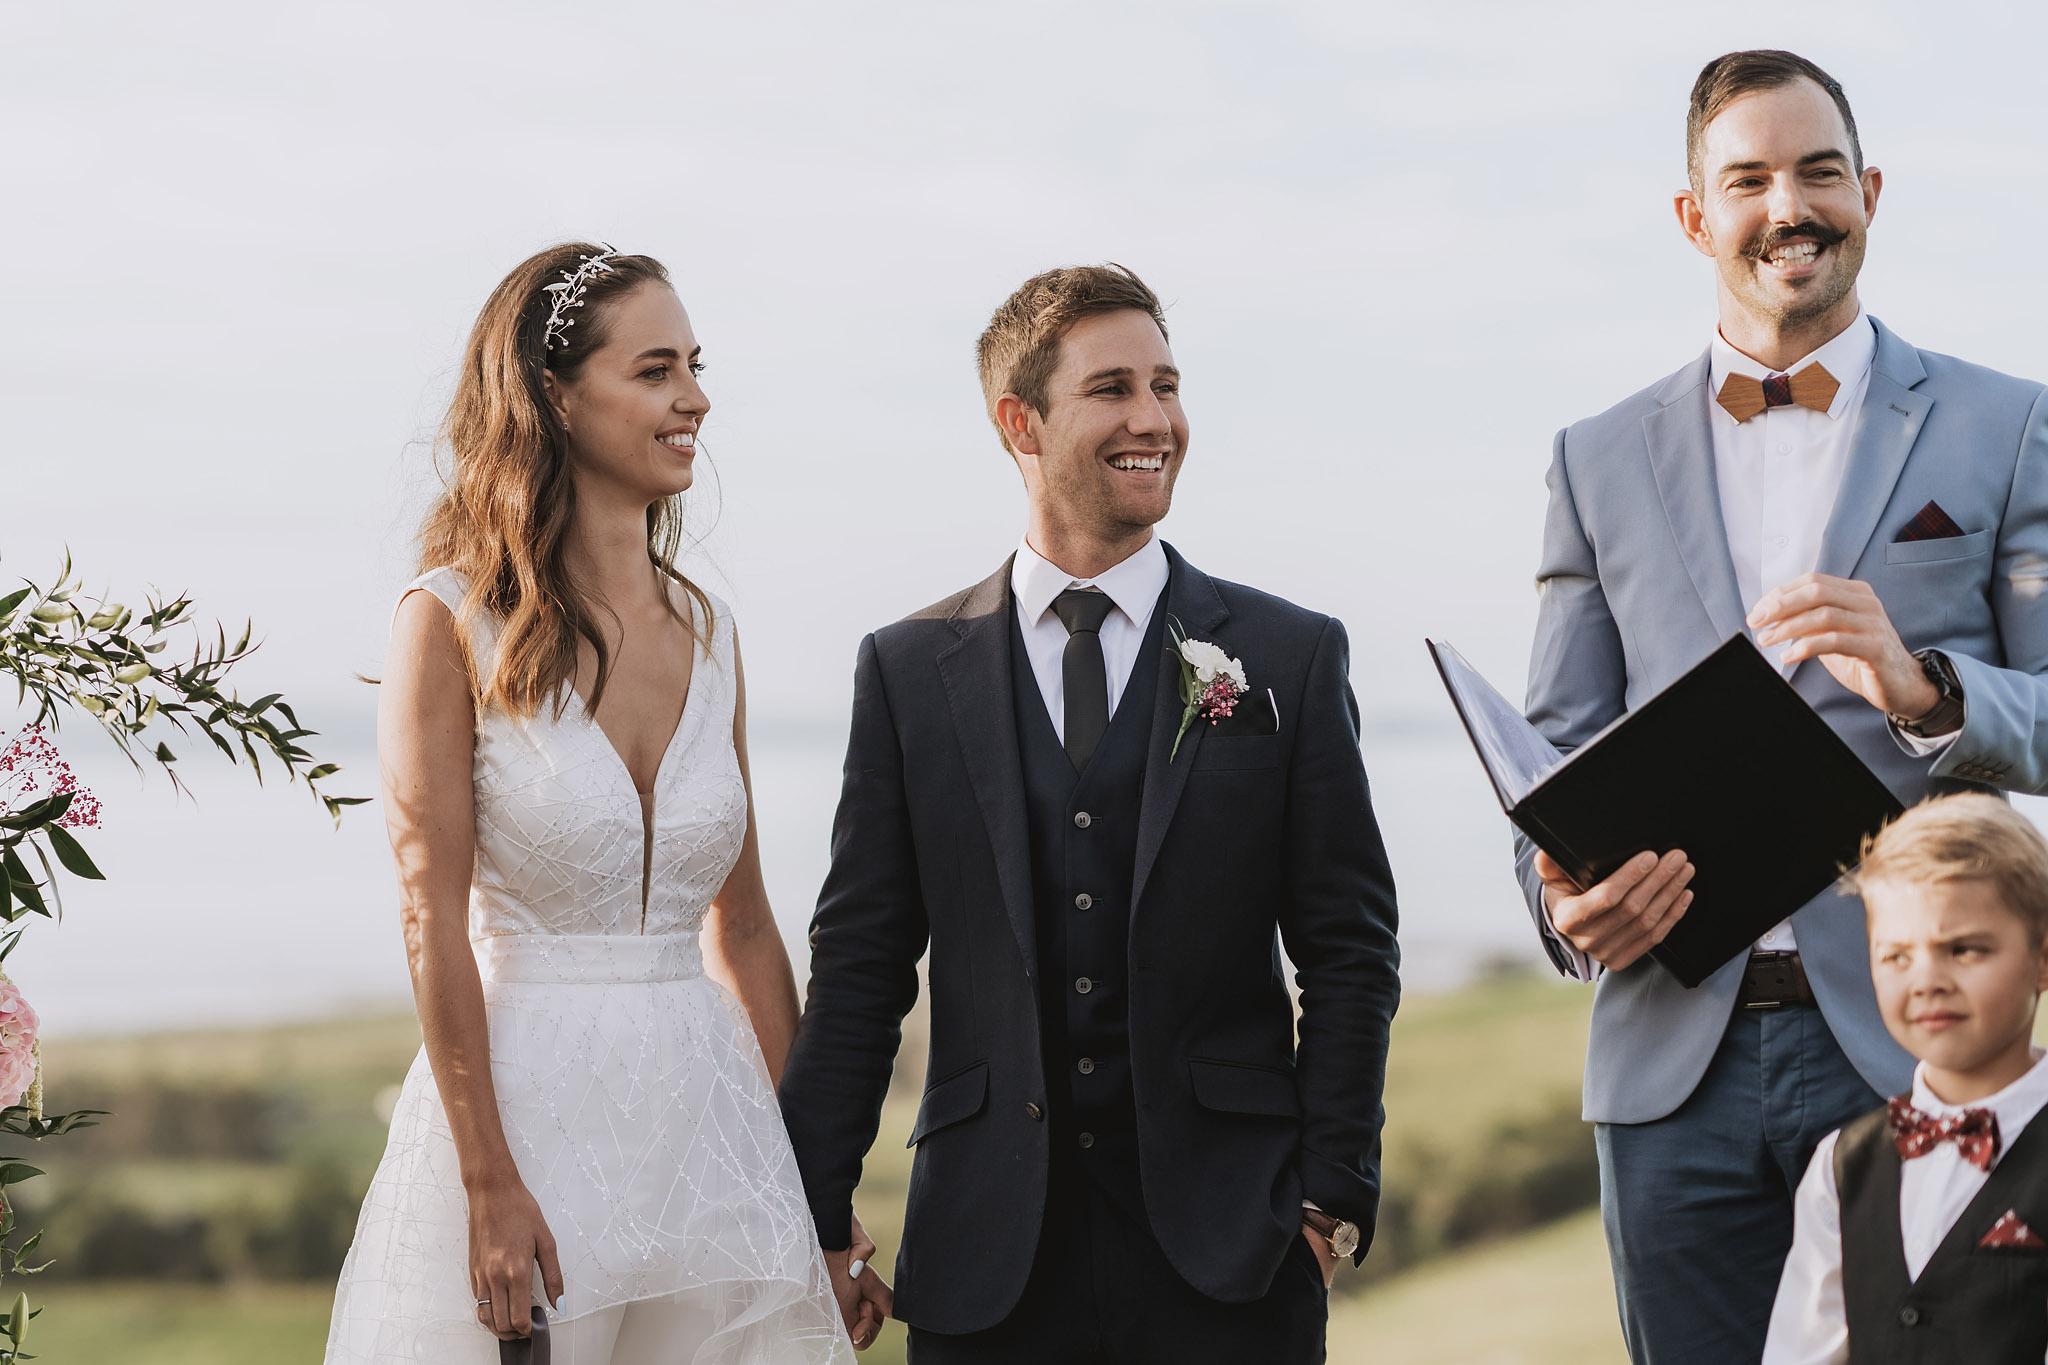 rambo-estrada-rubymatt-kauri-bay-boomrock-auckland-wedding-photographers-0590-c copy (1).jpg